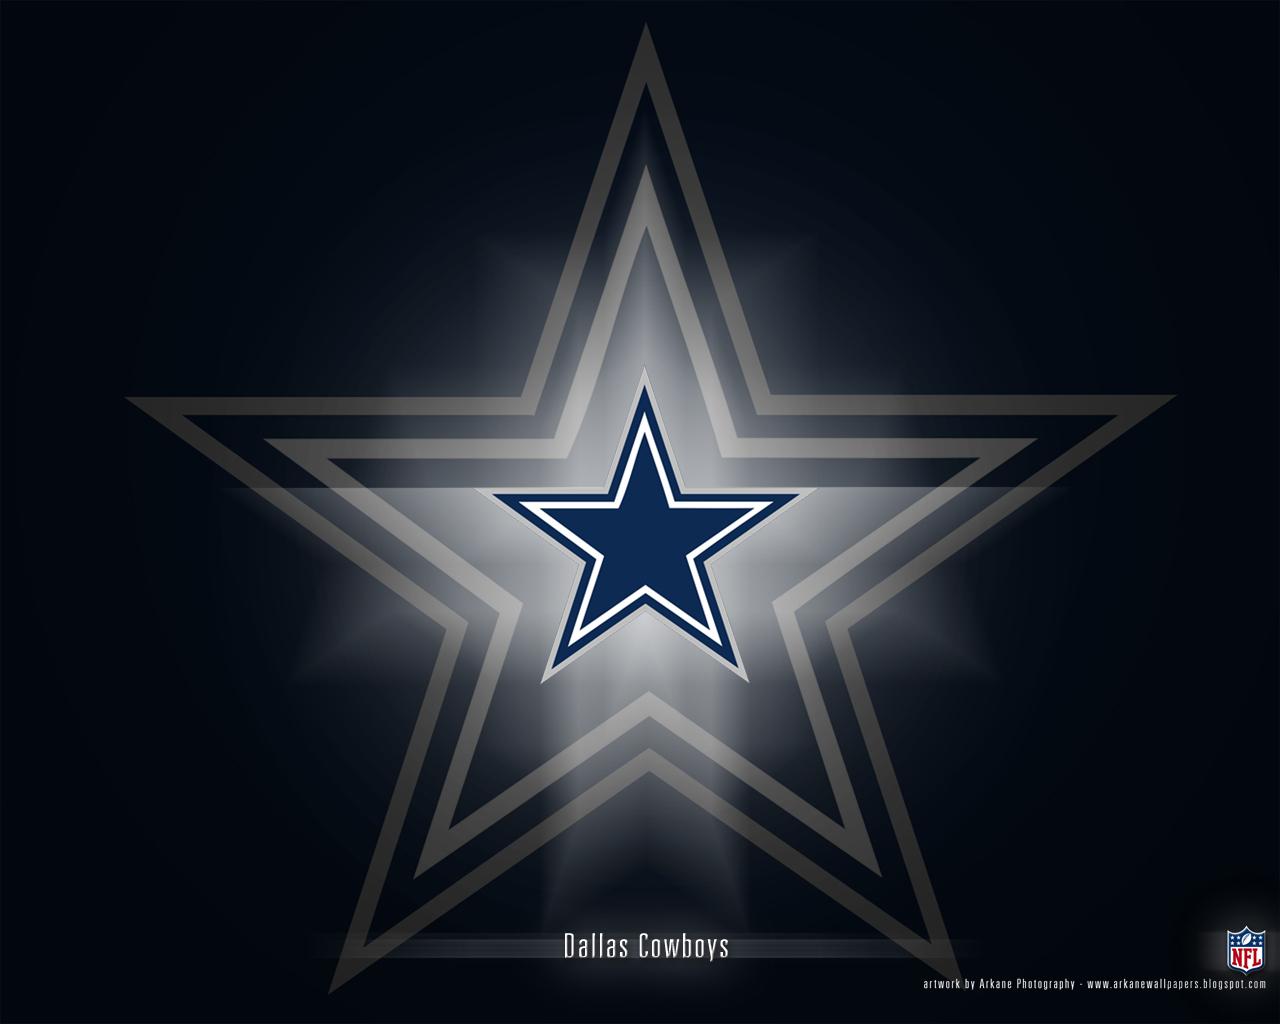 http://1.bp.blogspot.com/-n0kacbiyVEk/T4AG_L3z2PI/AAAAAAAACqs/O6JghrLluGM/s1600/Dallas-Cowboys-dallas-cowboys-9173313-1280-1024.jpg